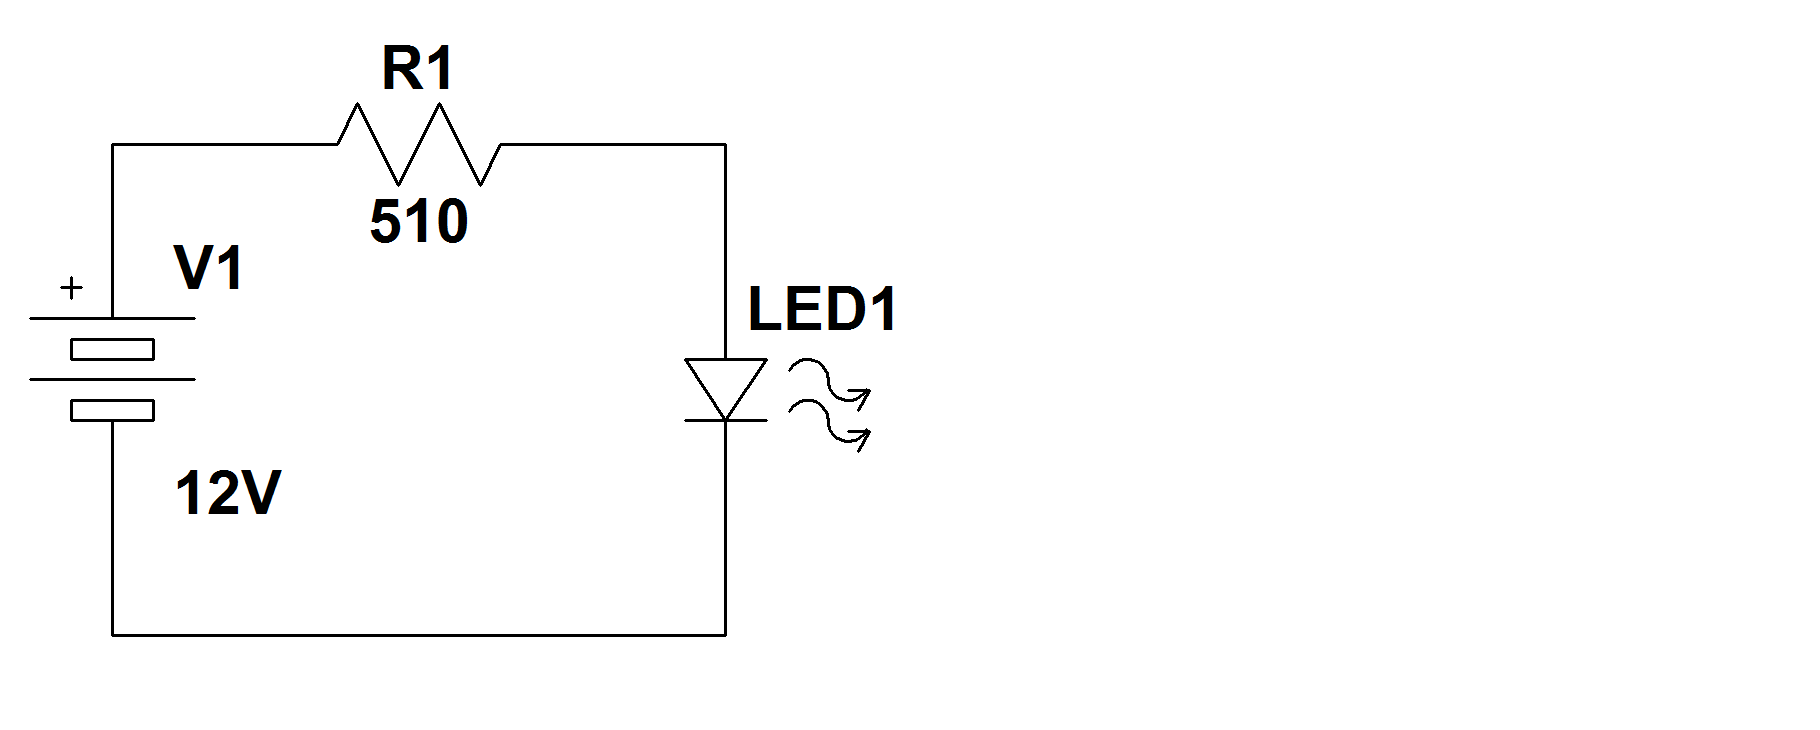 hight resolution of 3v 12v led wiring wiring diagram subcon 12 volt led light wiring diagram 3v 12v led wiring